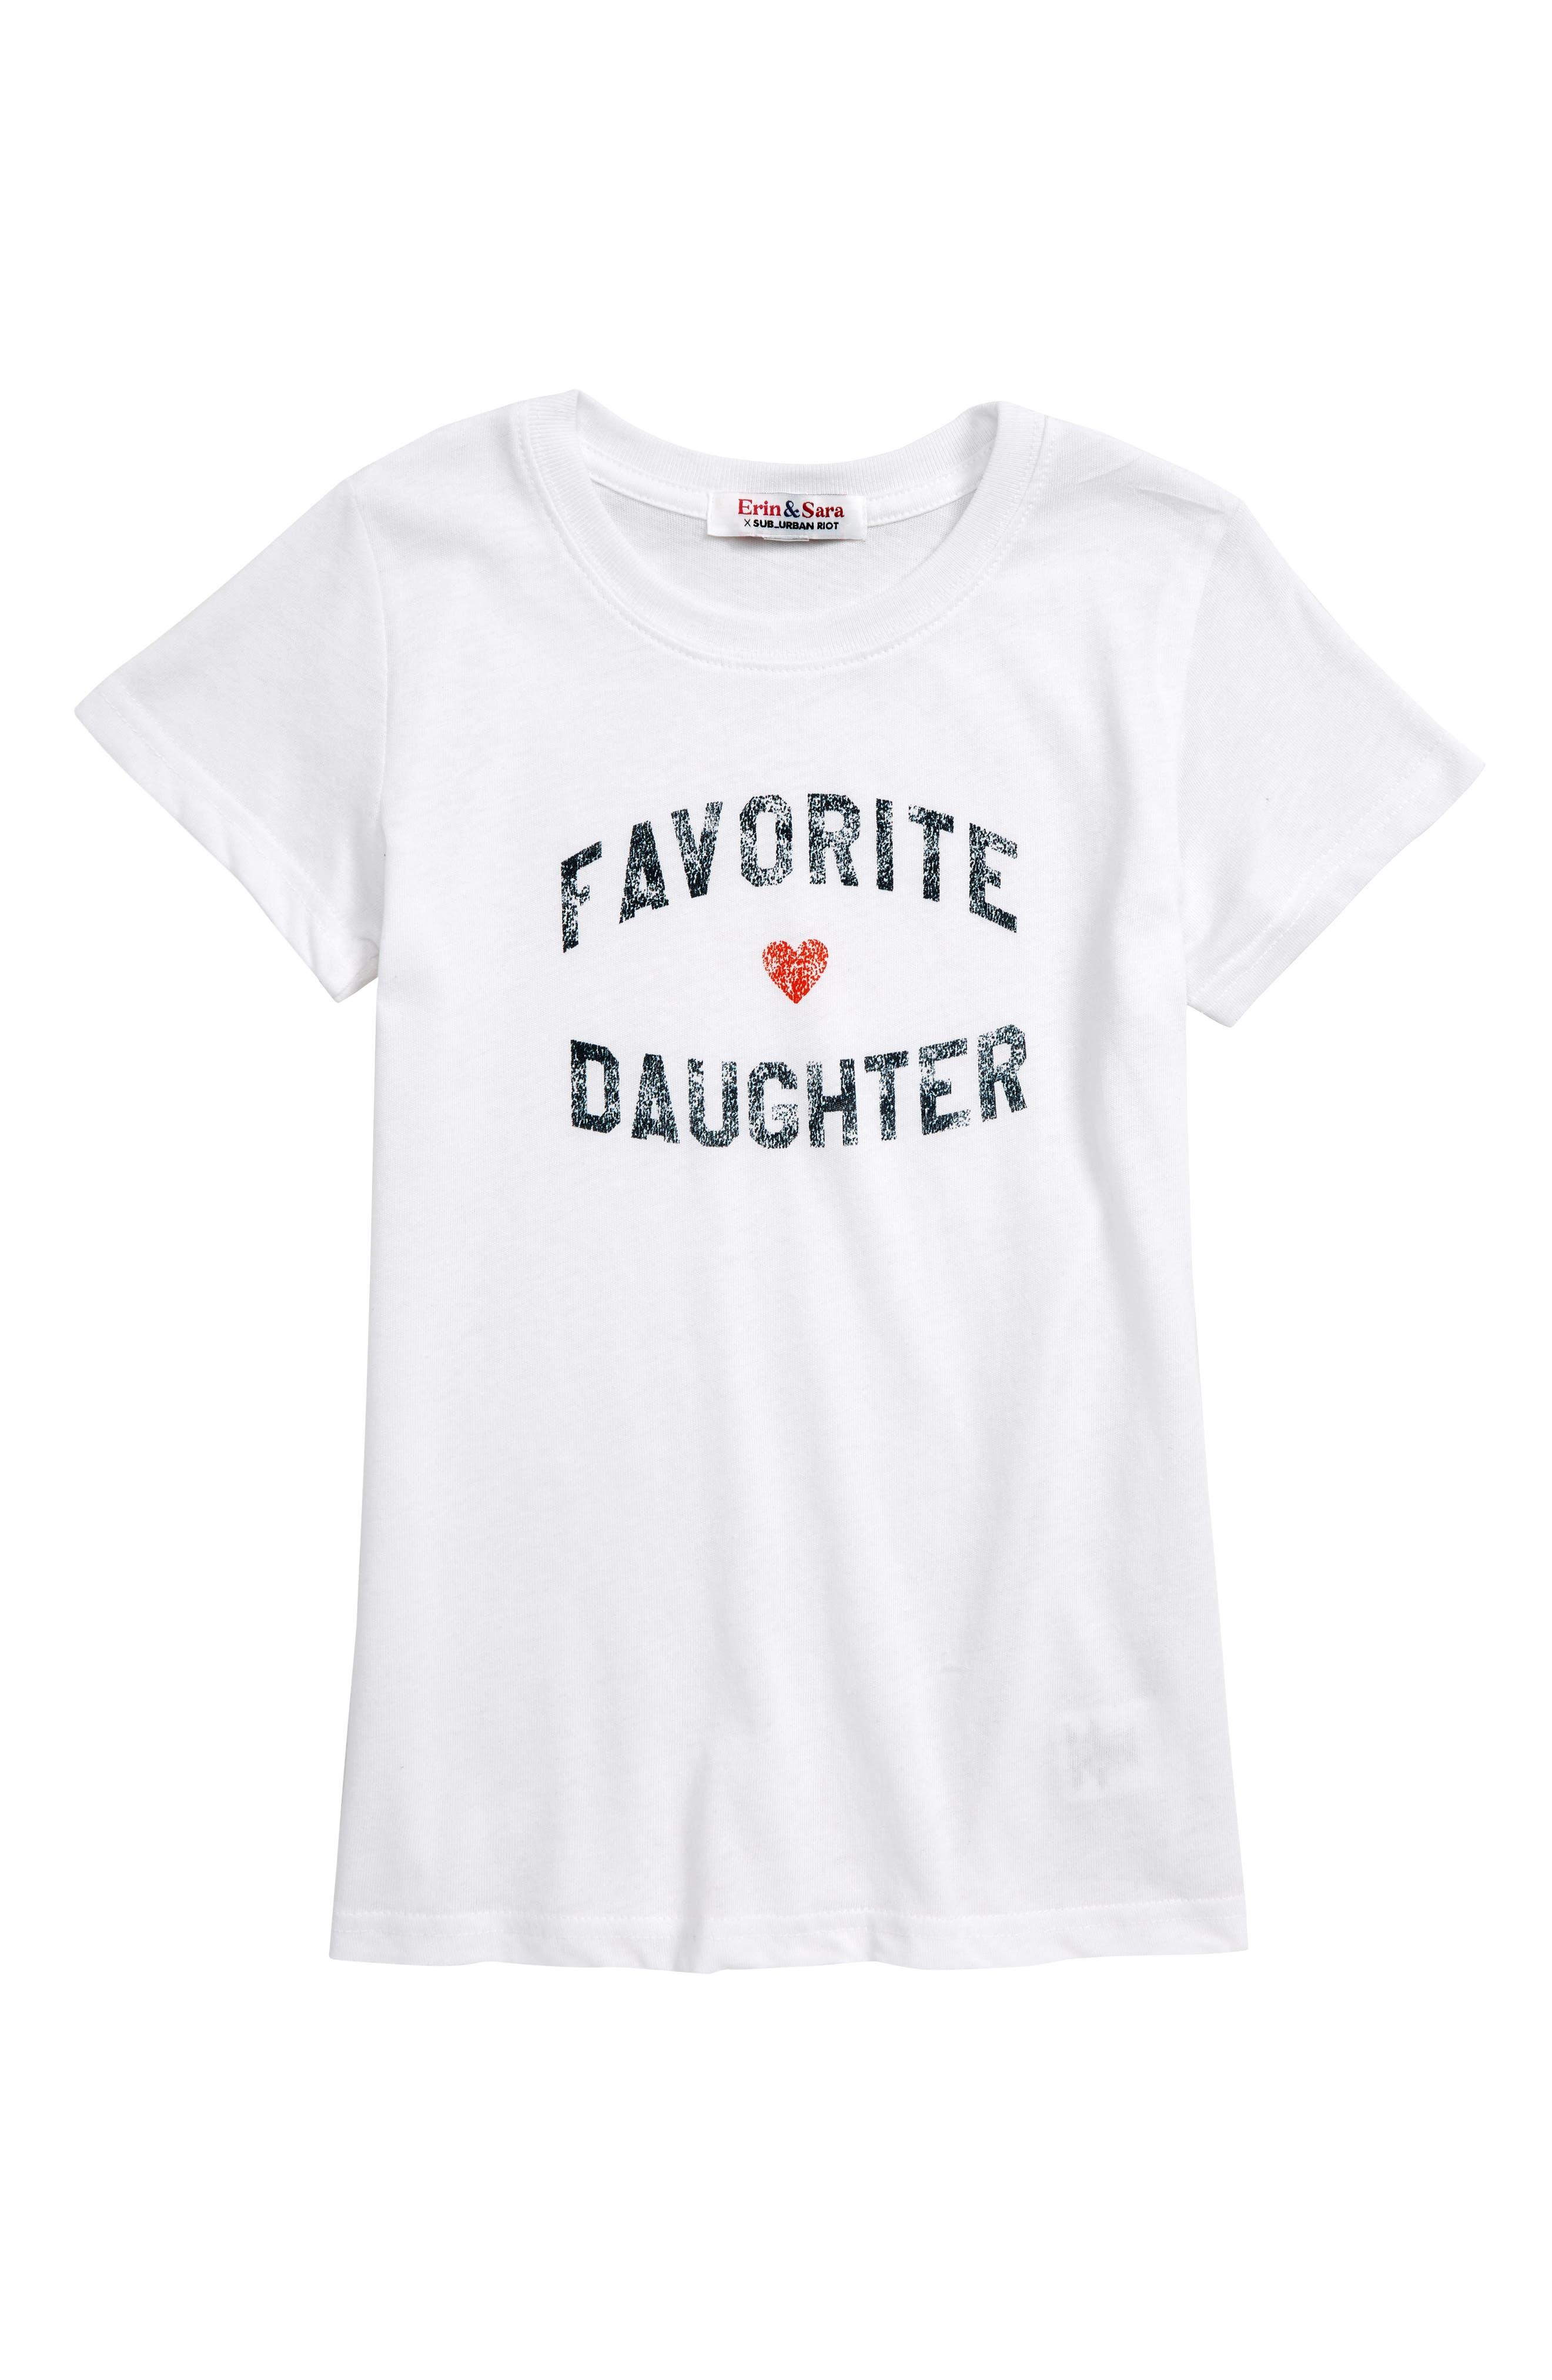 SUB_URBAN RIOT Favorite Daughter Graphic Tee, Main, color, WHITE